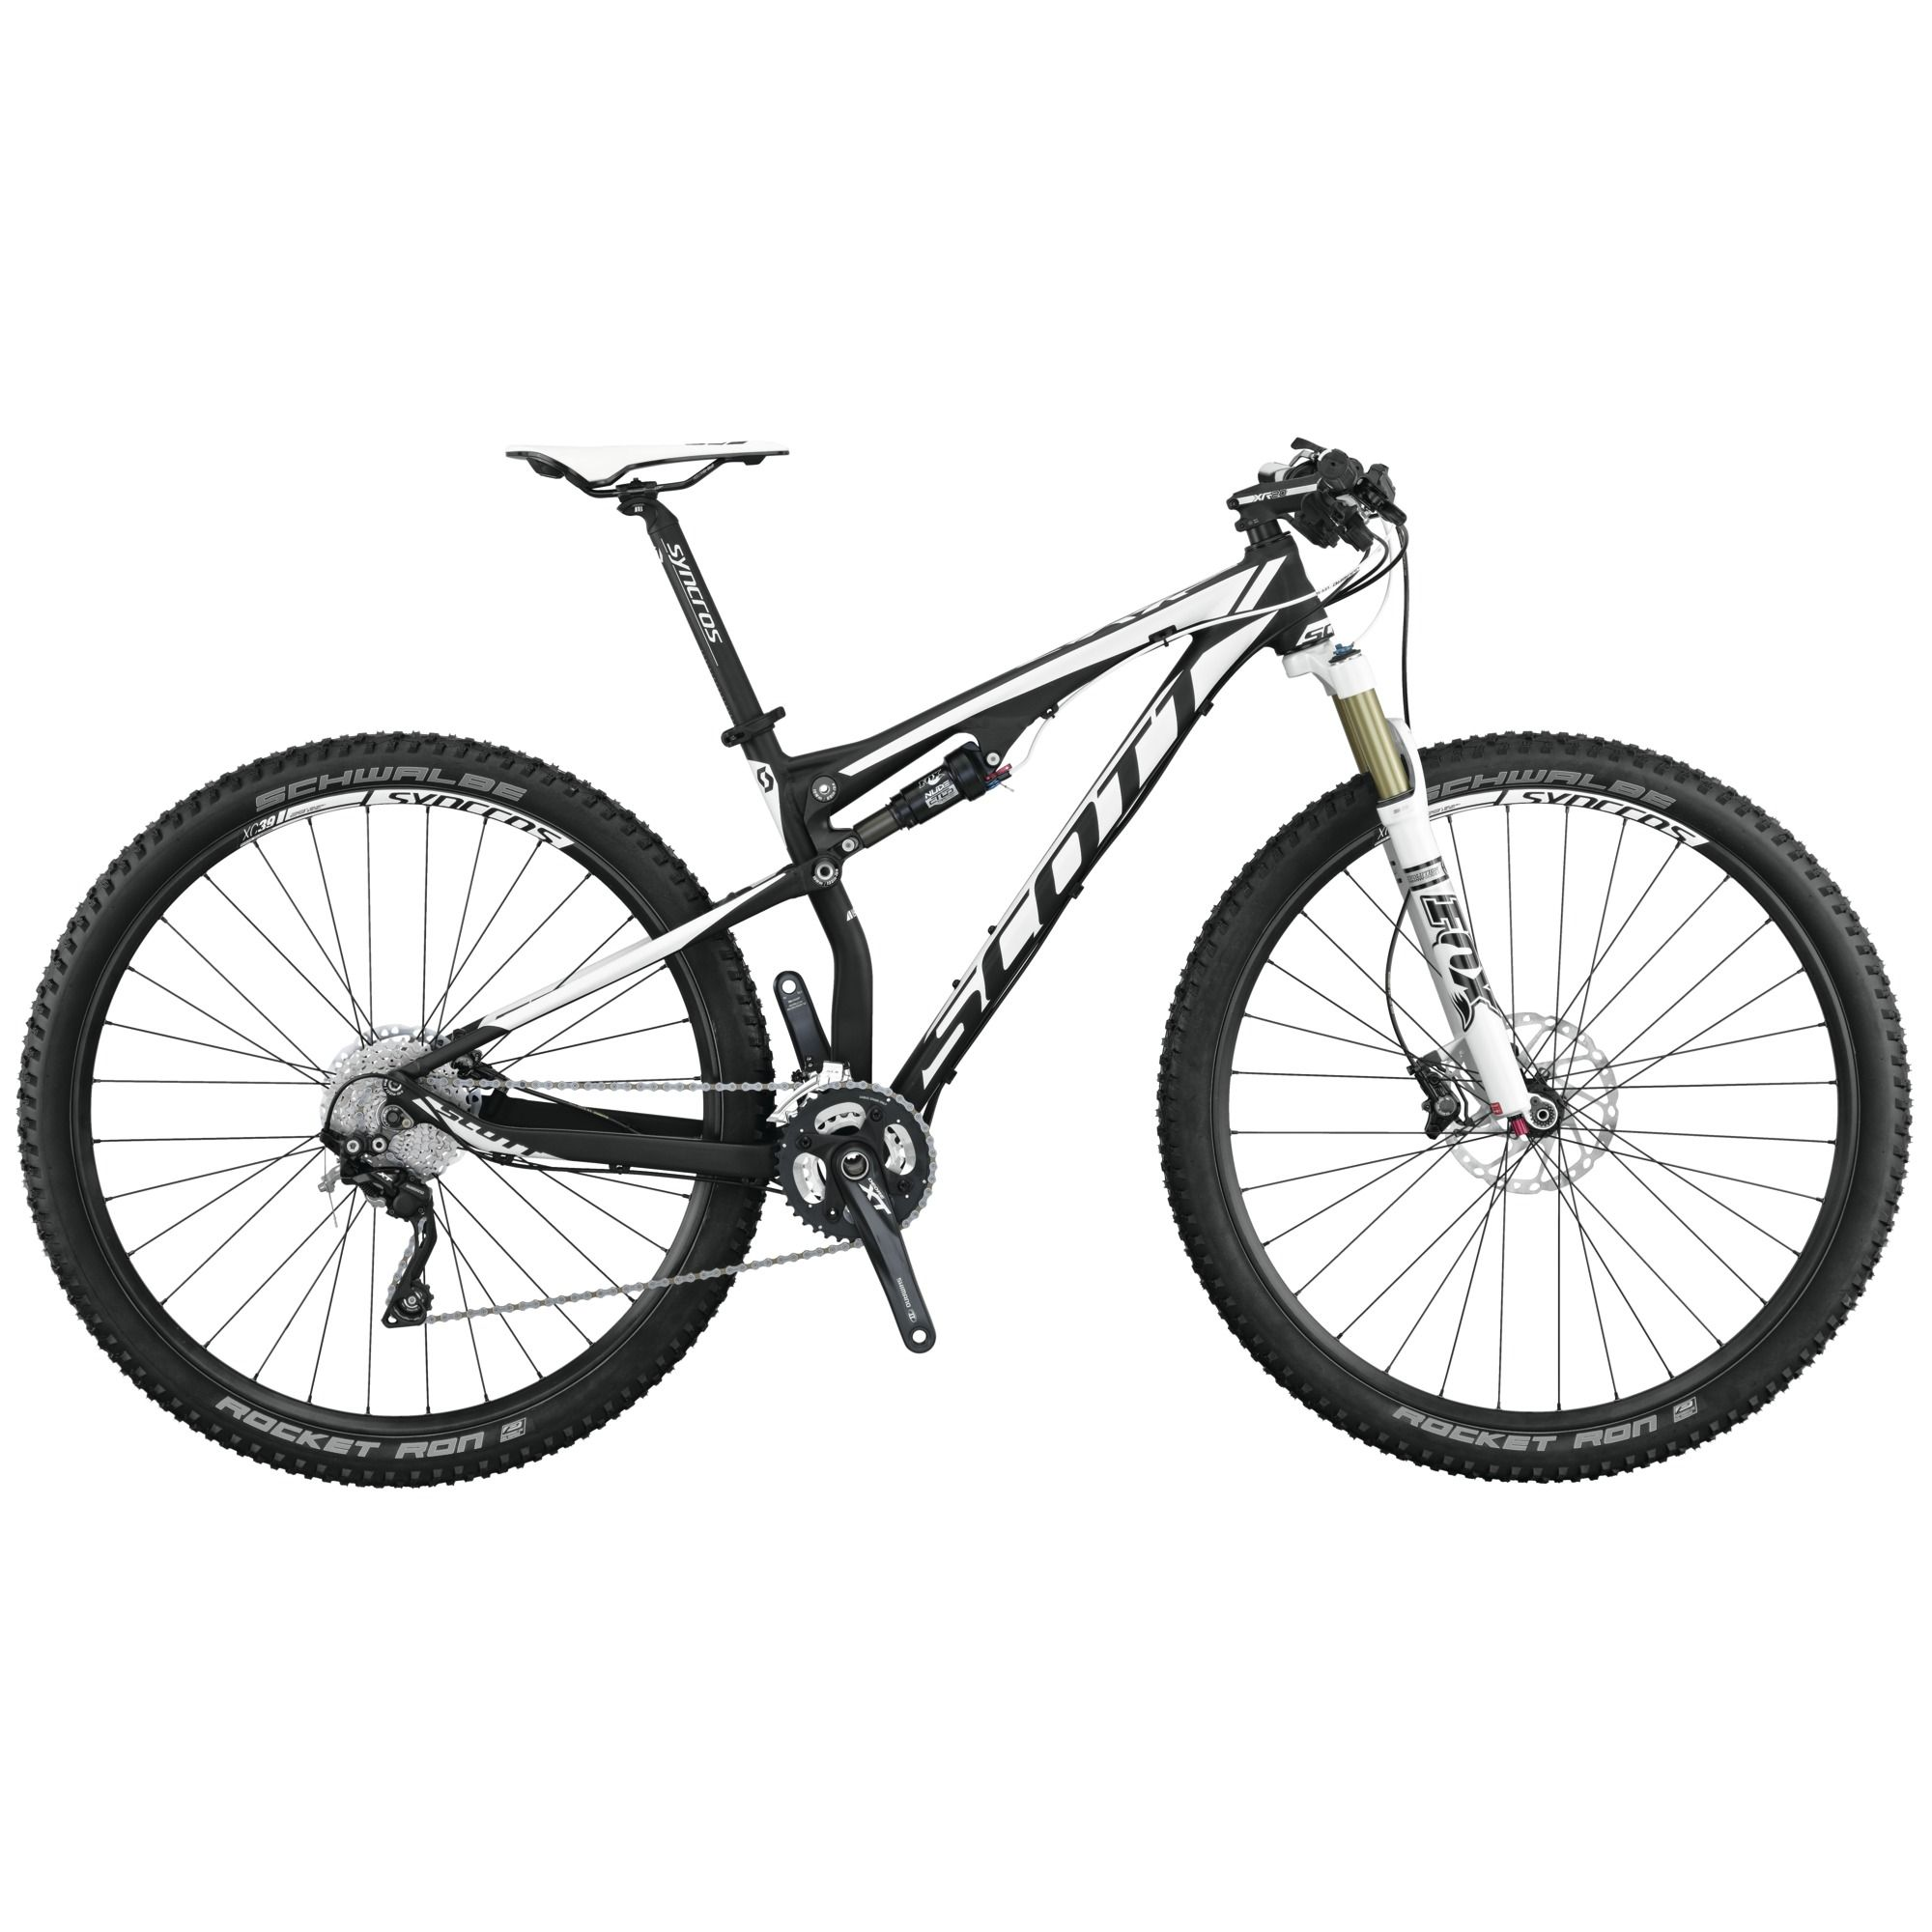 Scott Spark 940 Bike Alloy Scott Scale Bicycle Carbon Fiber